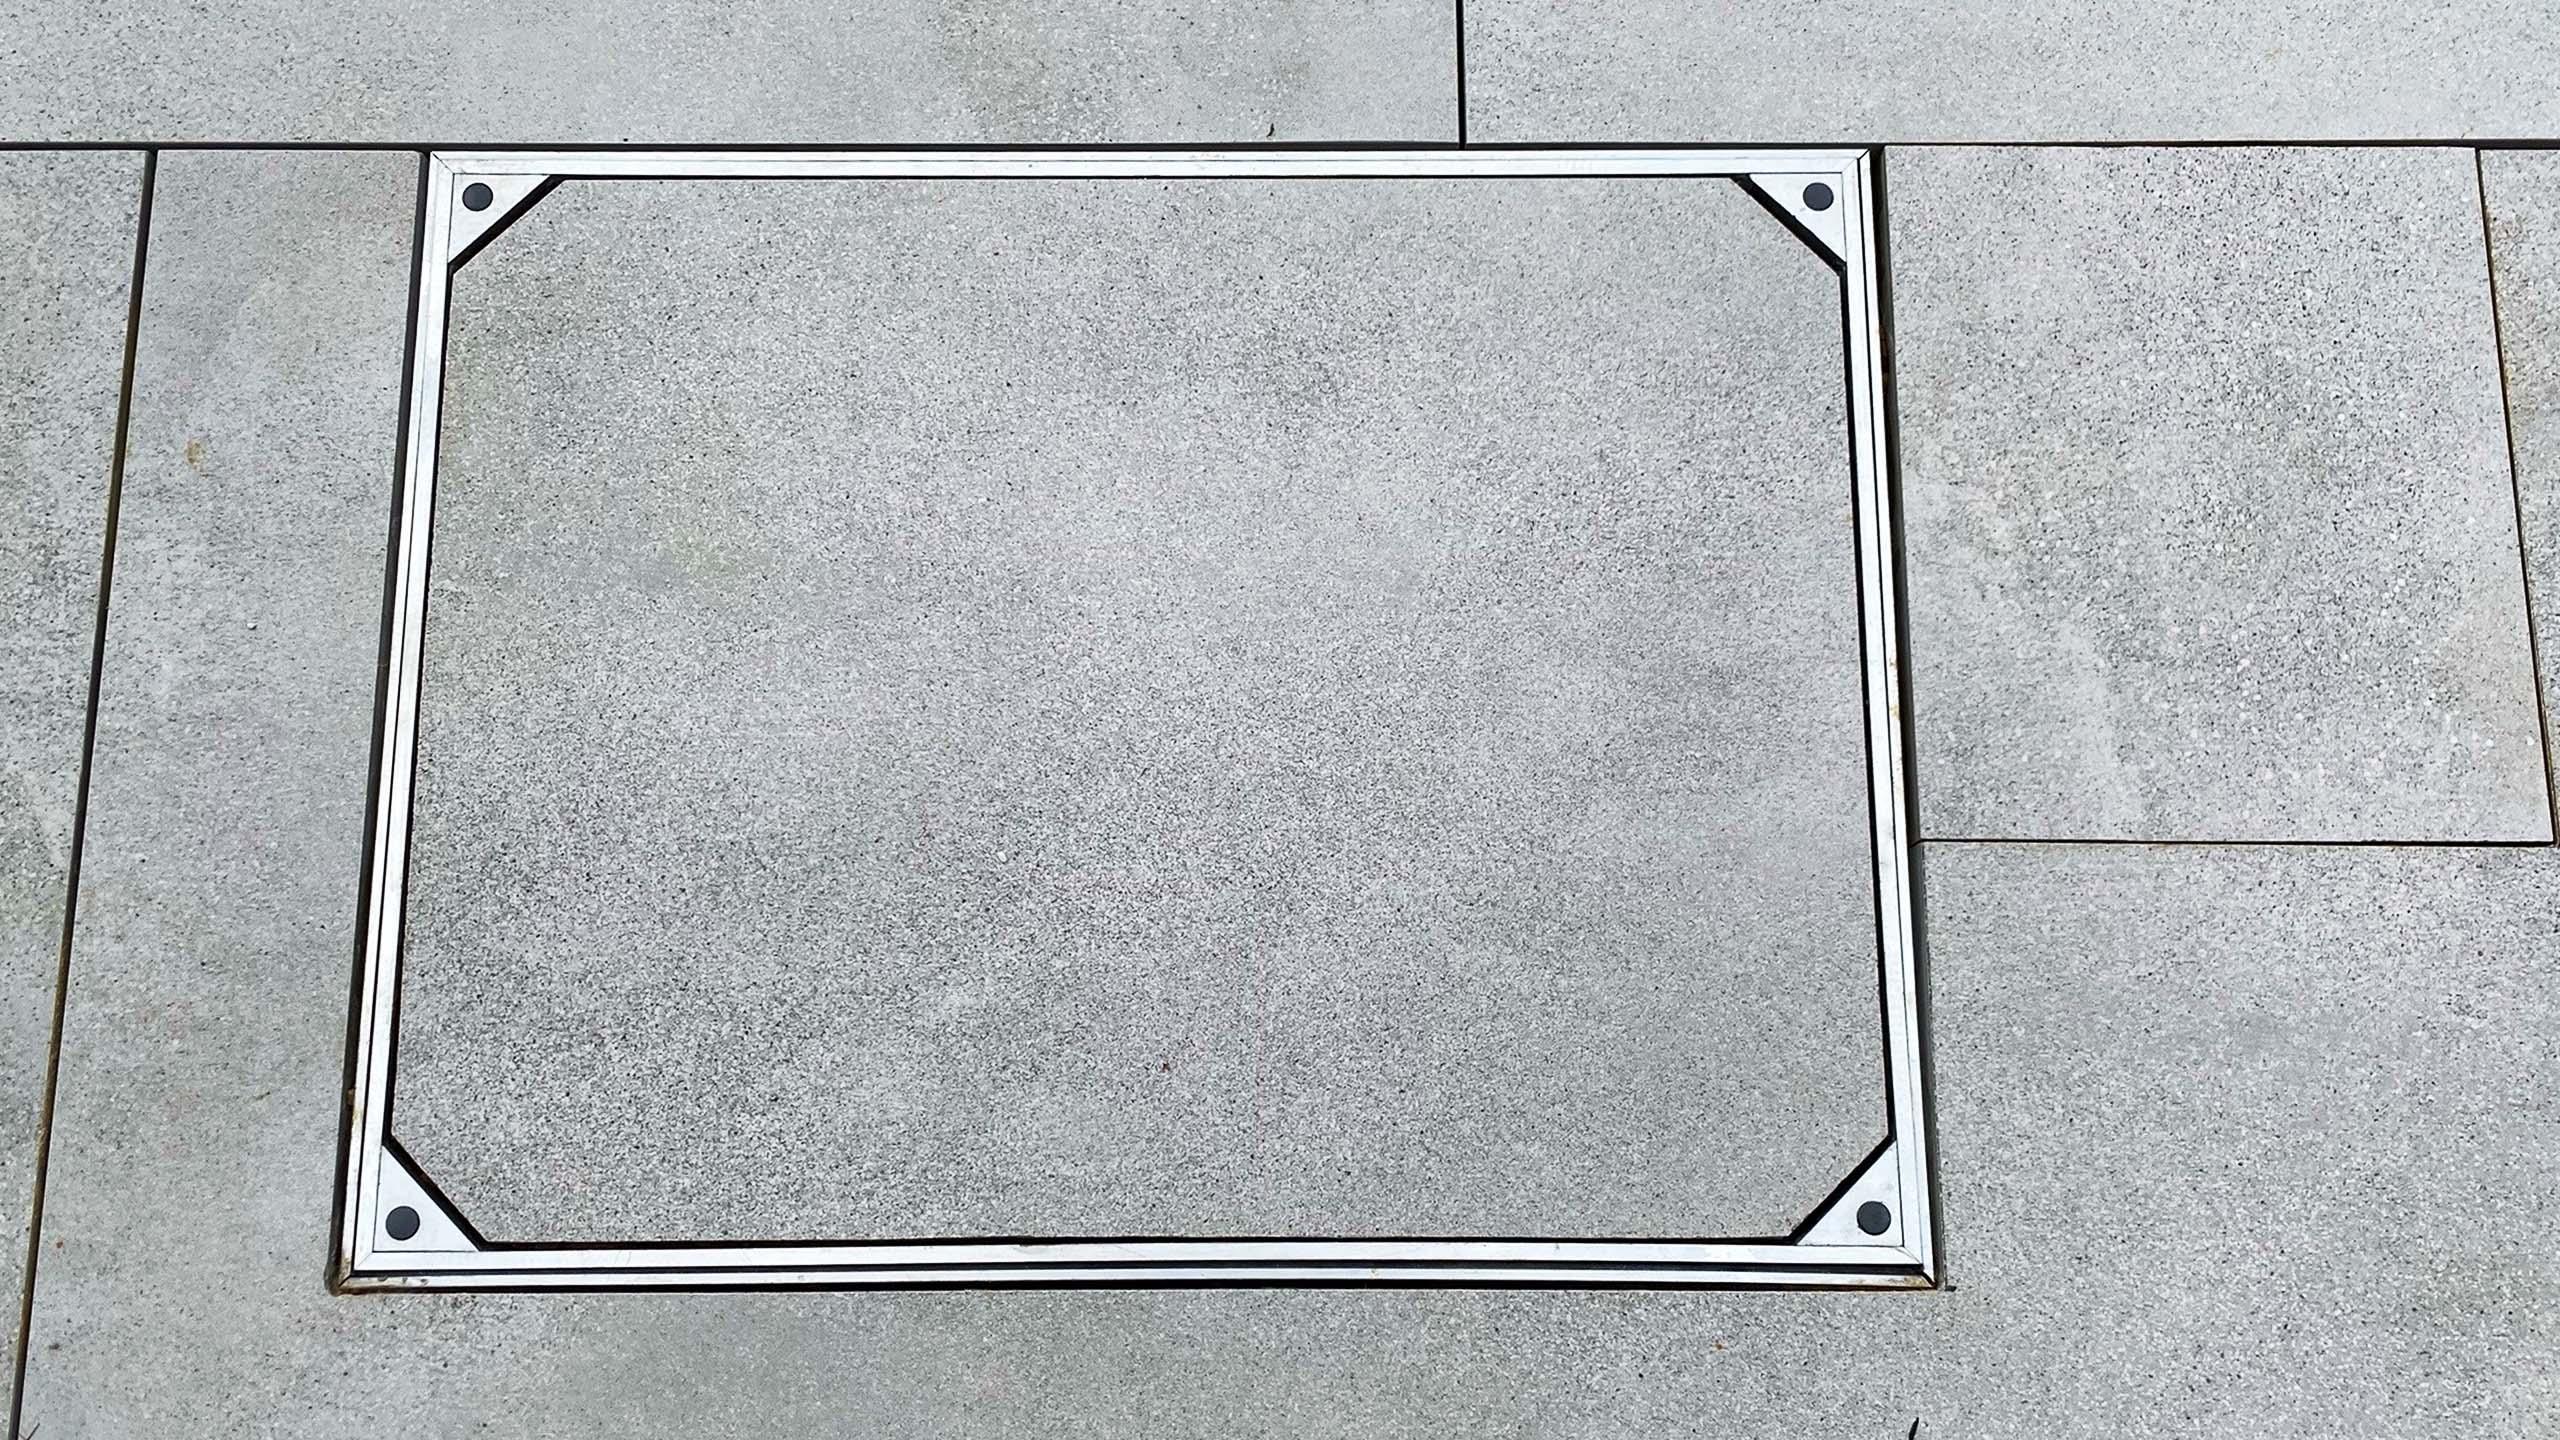 Aluminium Triple Sealed Rectangle Manhole Cover With Slab Floor